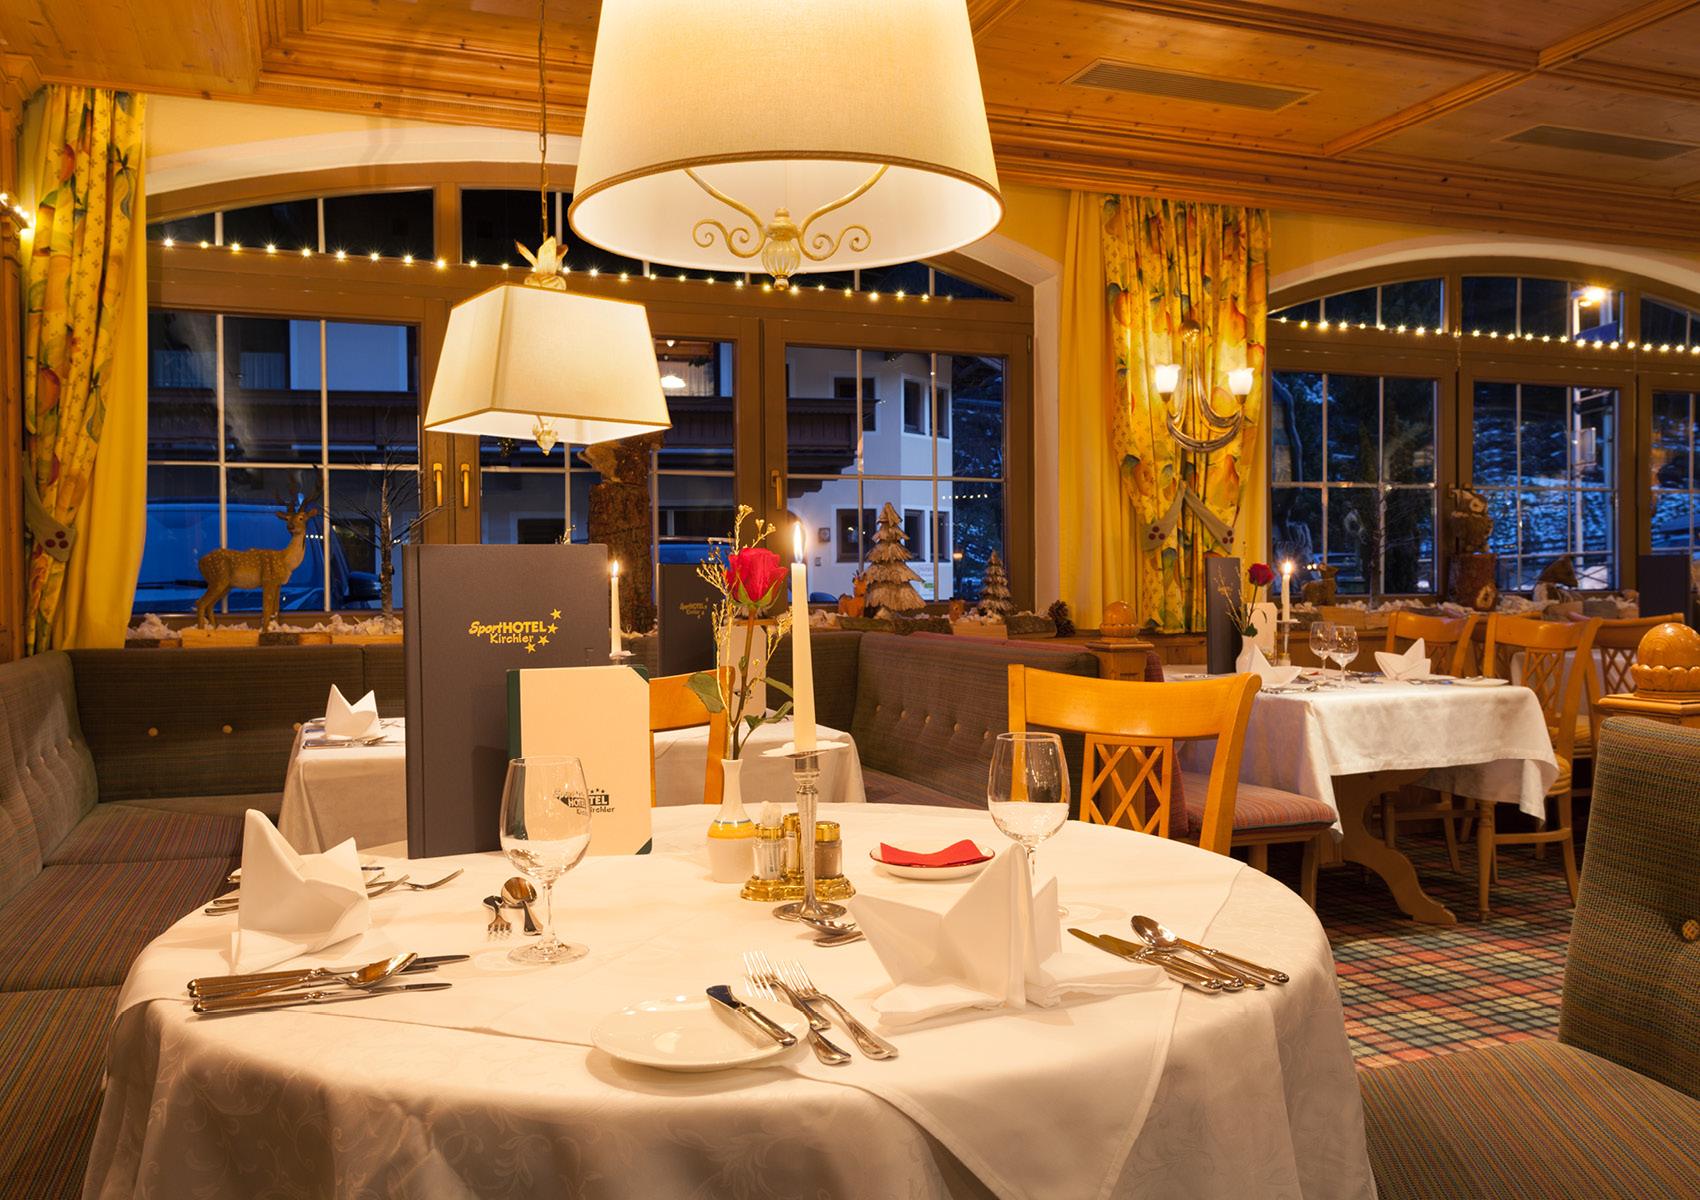 Restaurant Sporthotel Kirchler